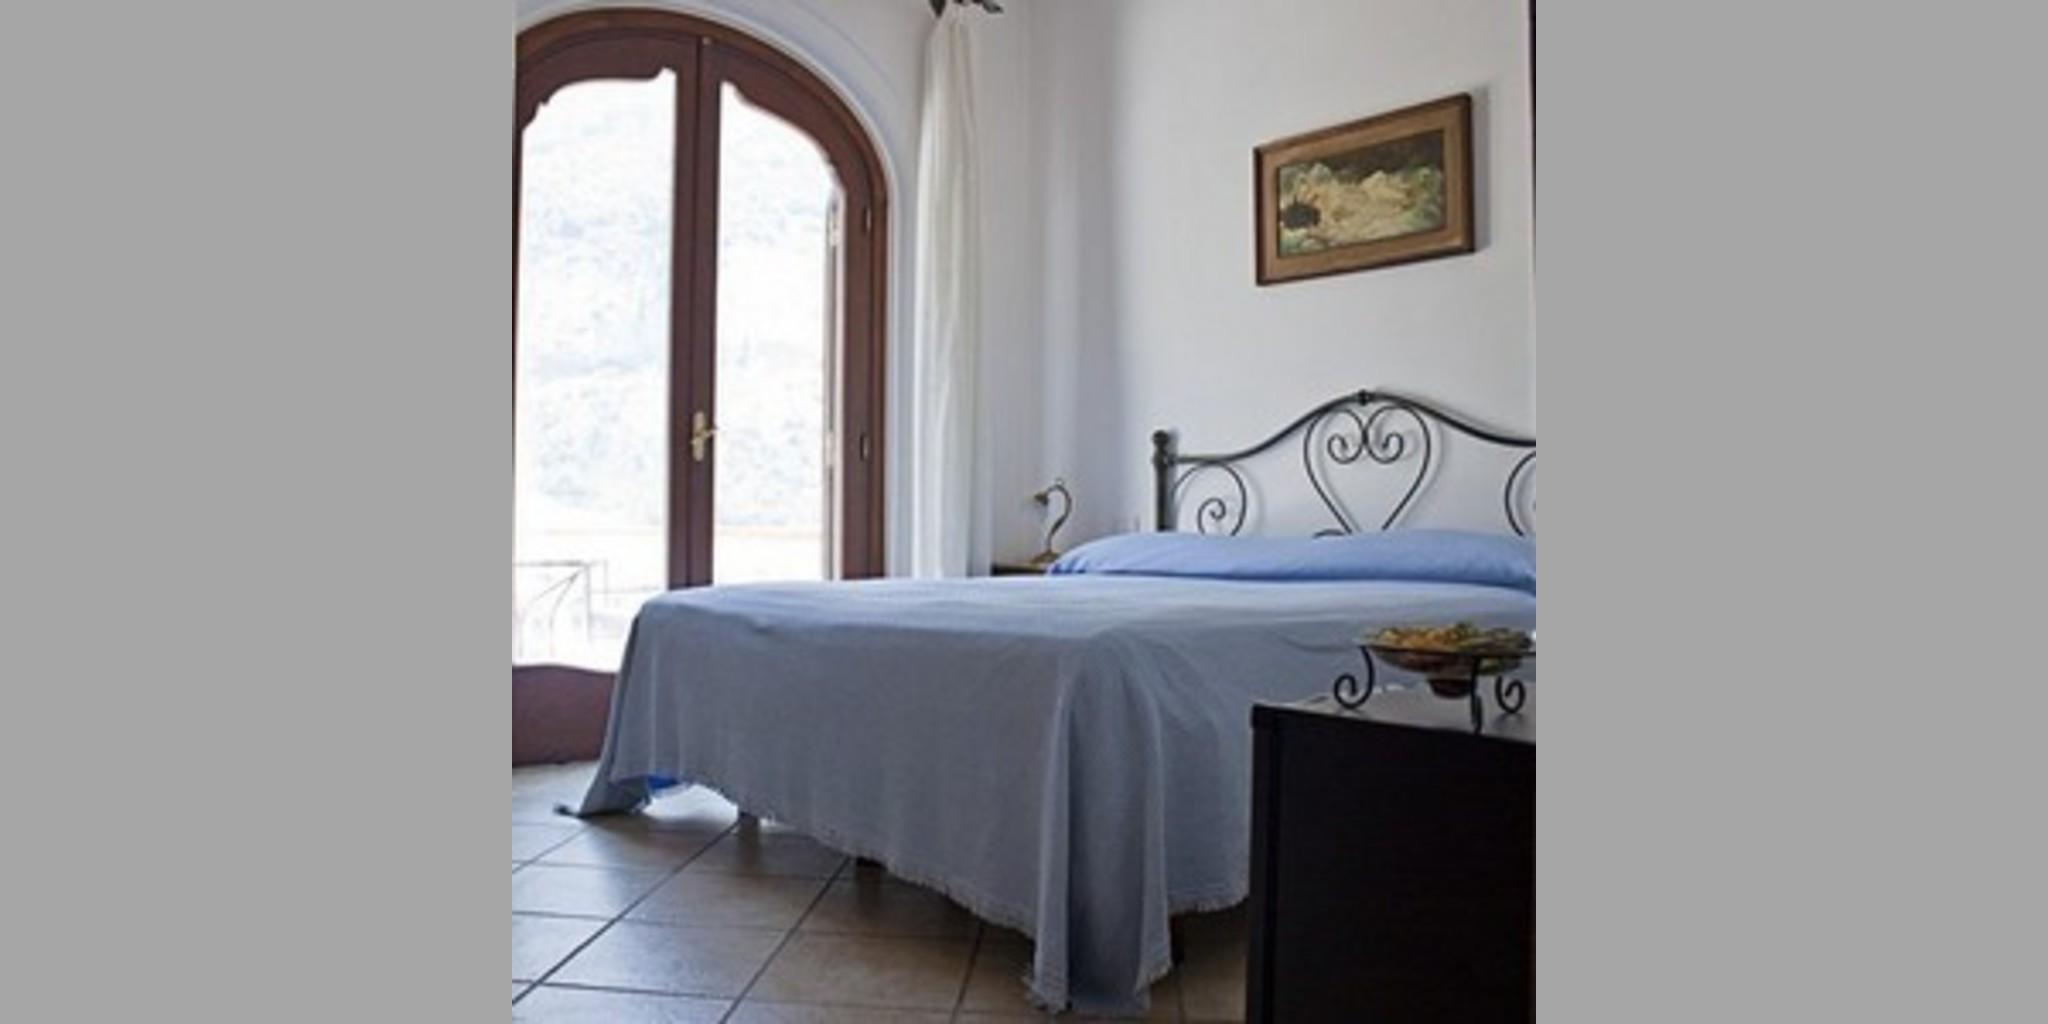 Bed & Breakfast Positano - Costiera Amalfitana Villa A Positano